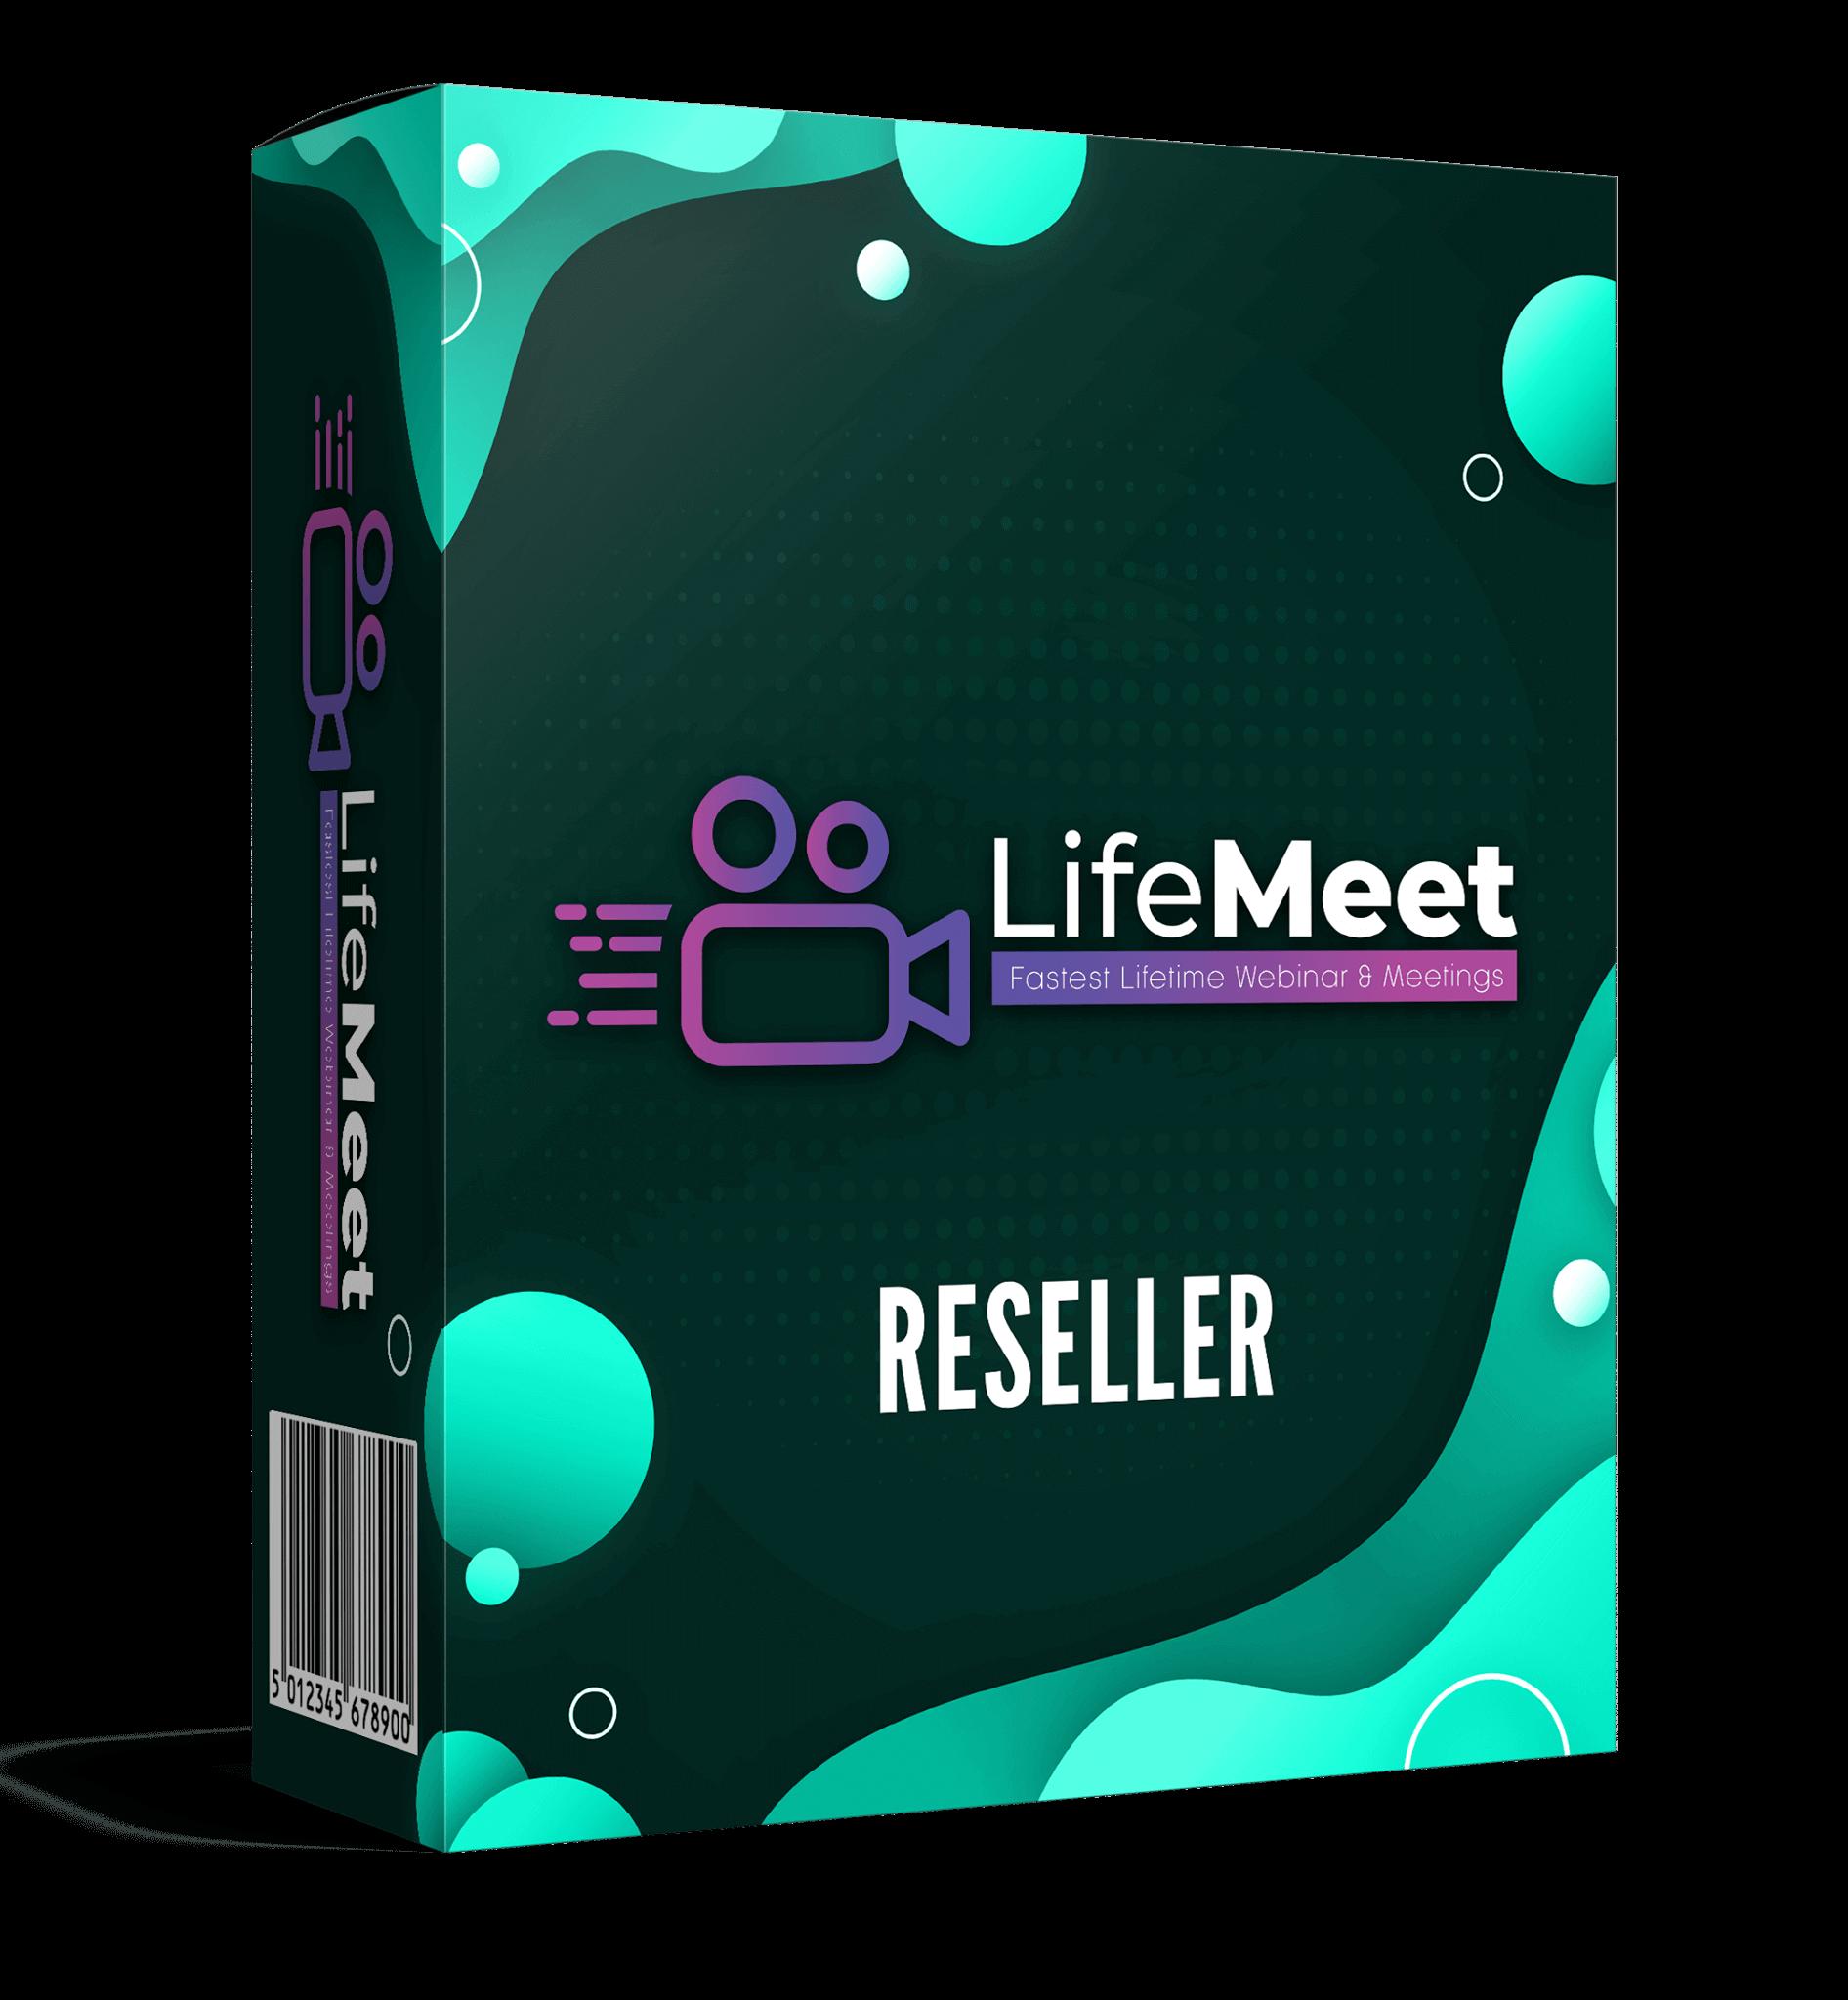 LifeMeet-oto-5